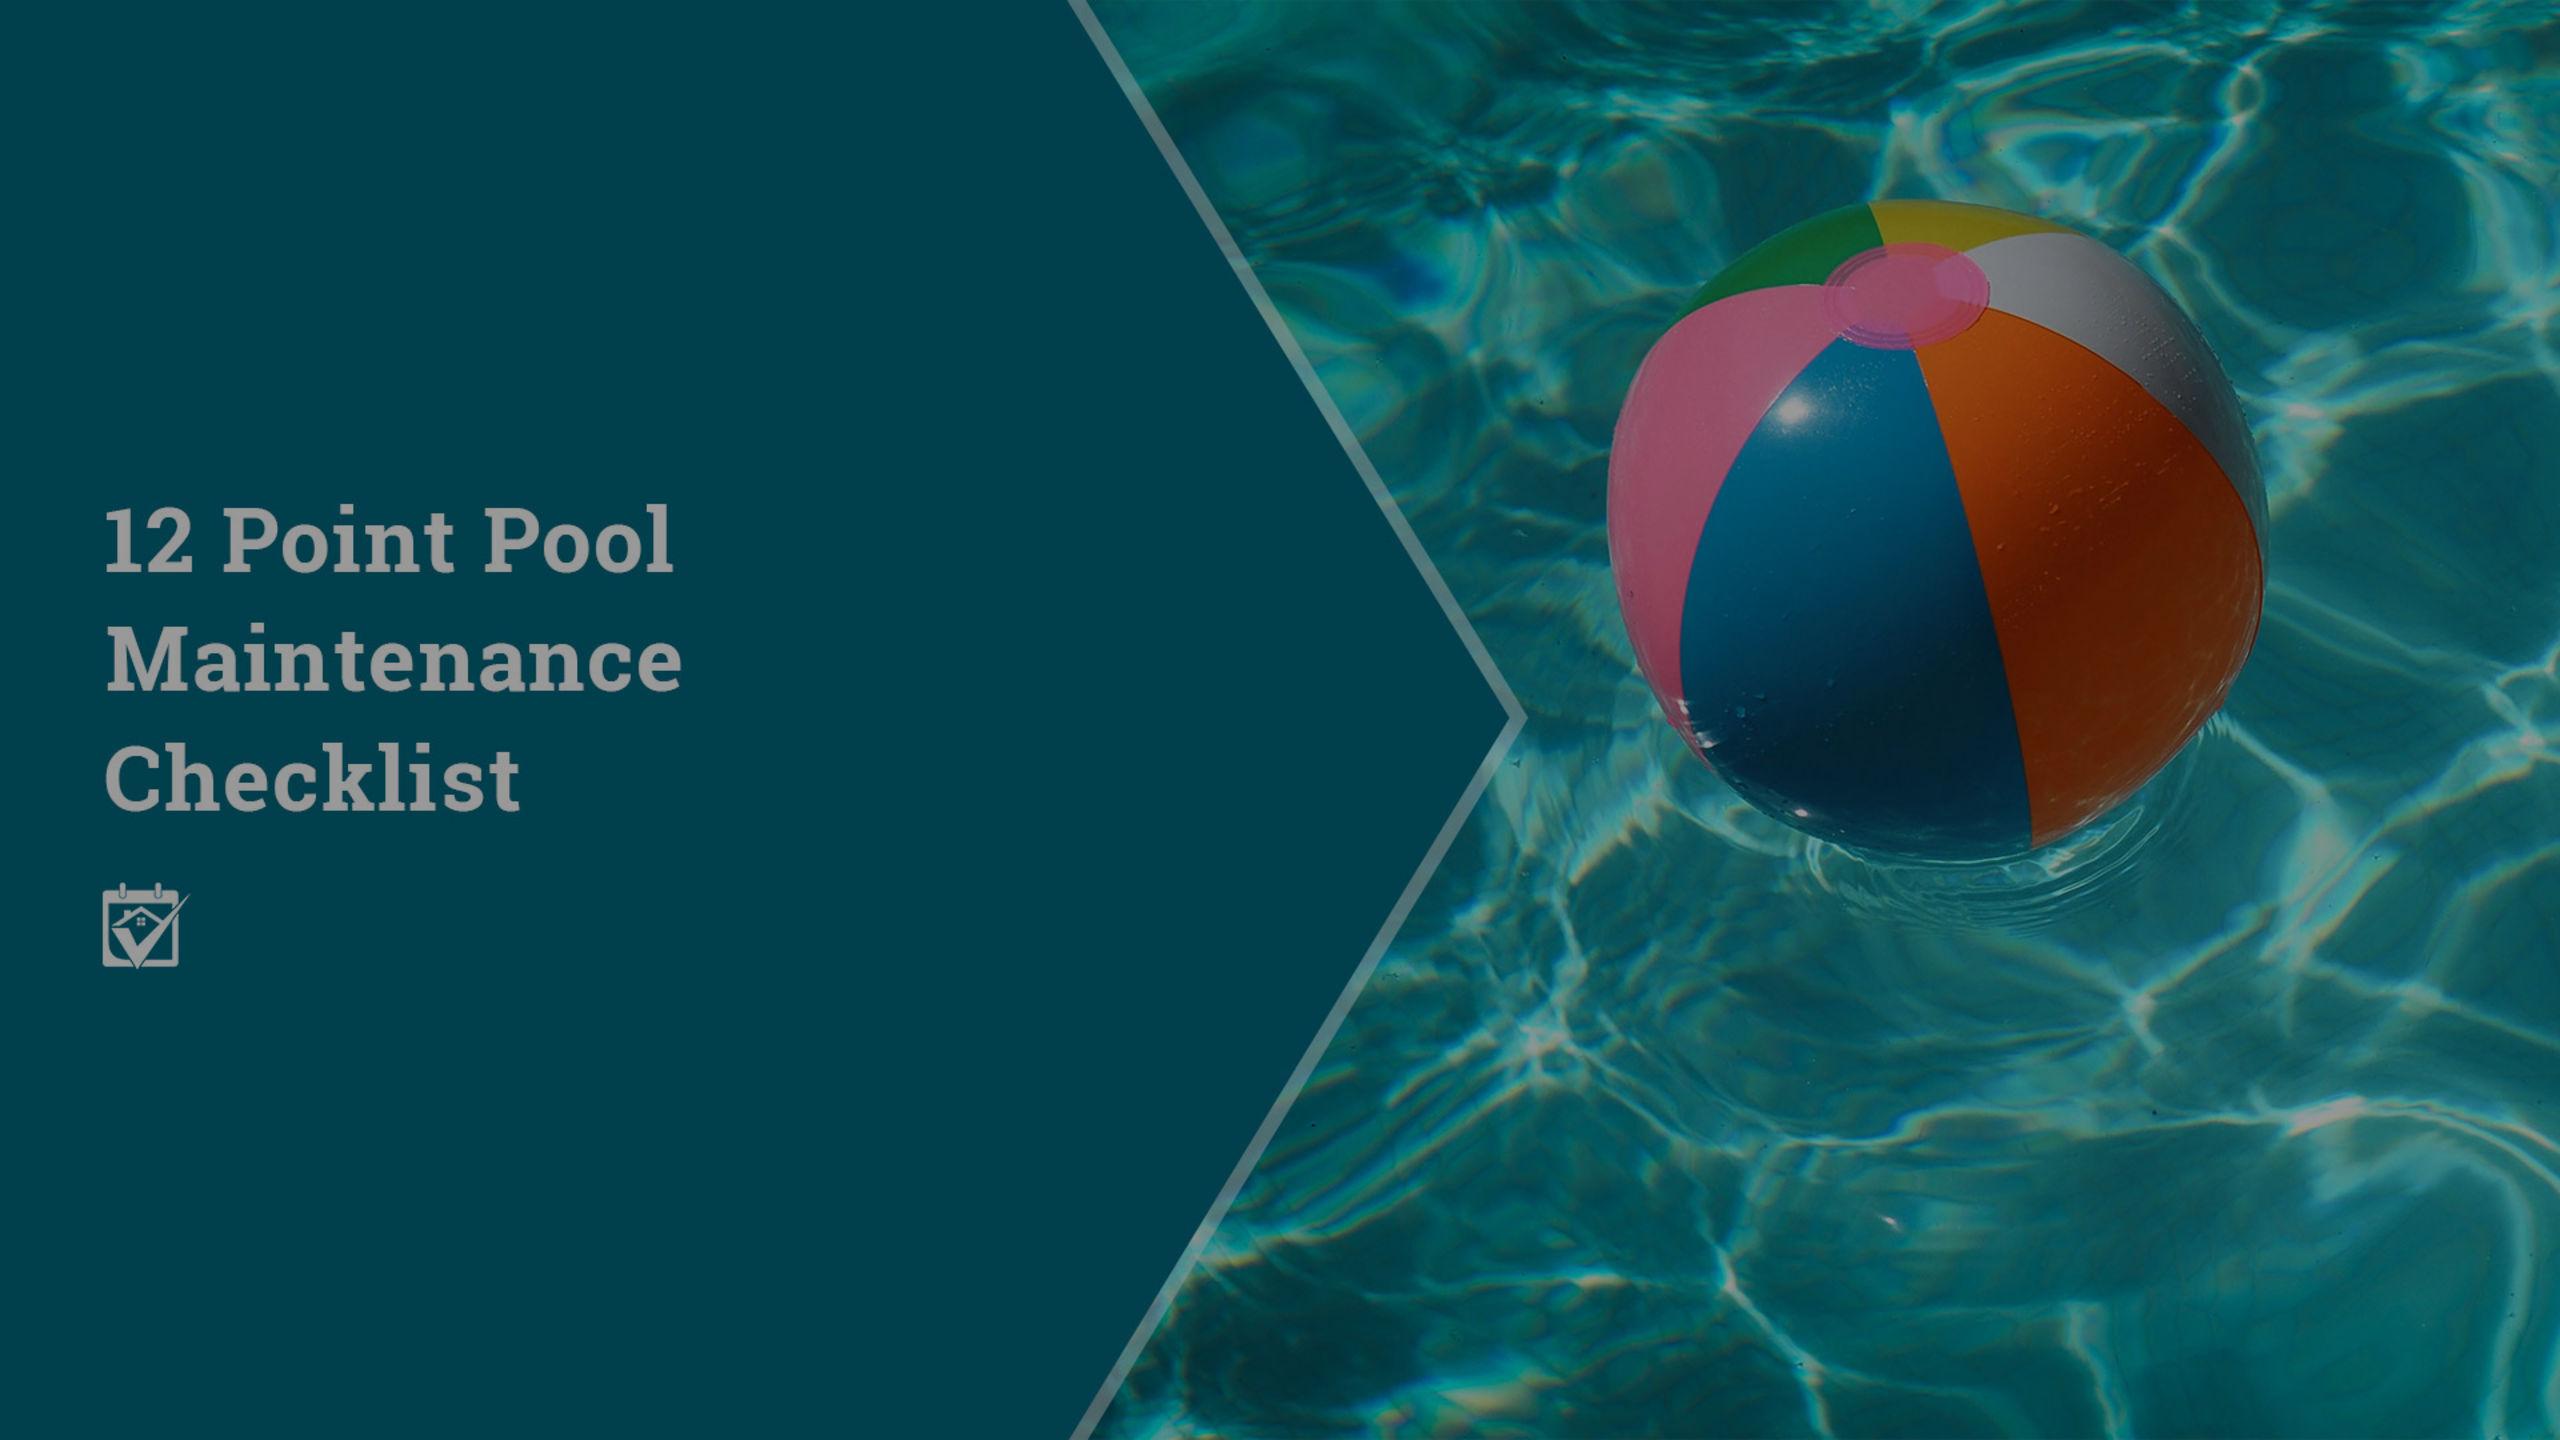 Twelve Point Pool Maintenance Checklist